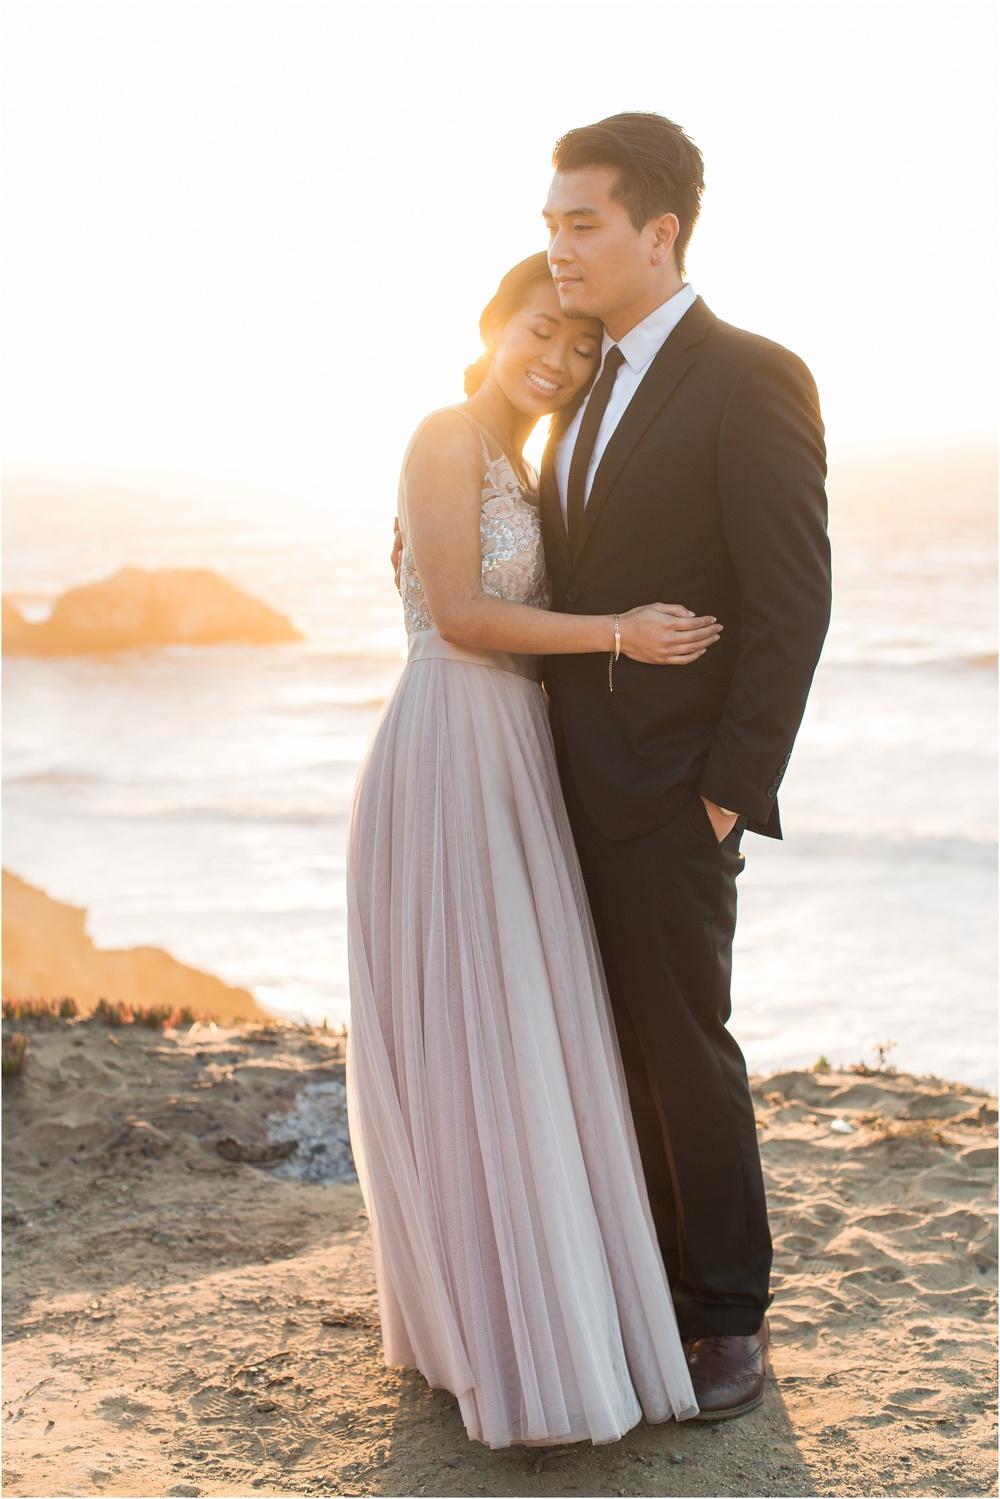 blueberryphotography.com | San Francisco Based Wedding & Lifestyle Photographer | Potrero Hill | San Francisco | Lands End